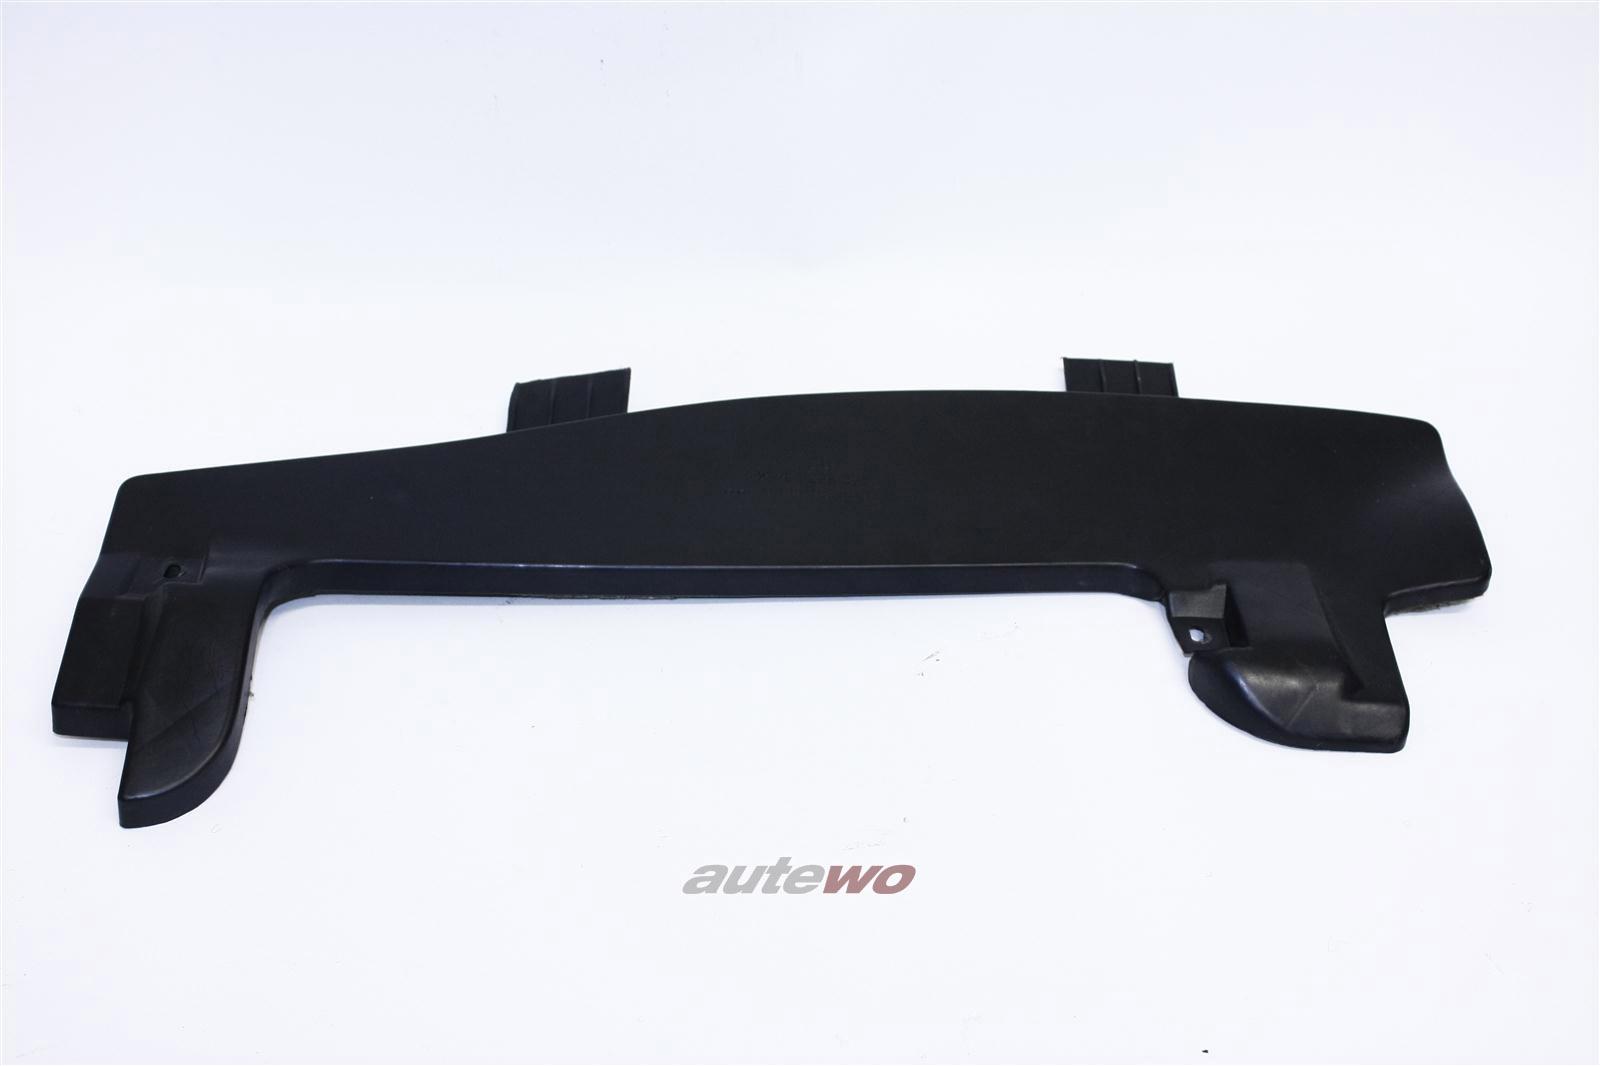 Audi 100/200 Typ 44 Abdeckung Amaturenbrett Rechts Schwarz 443863084K